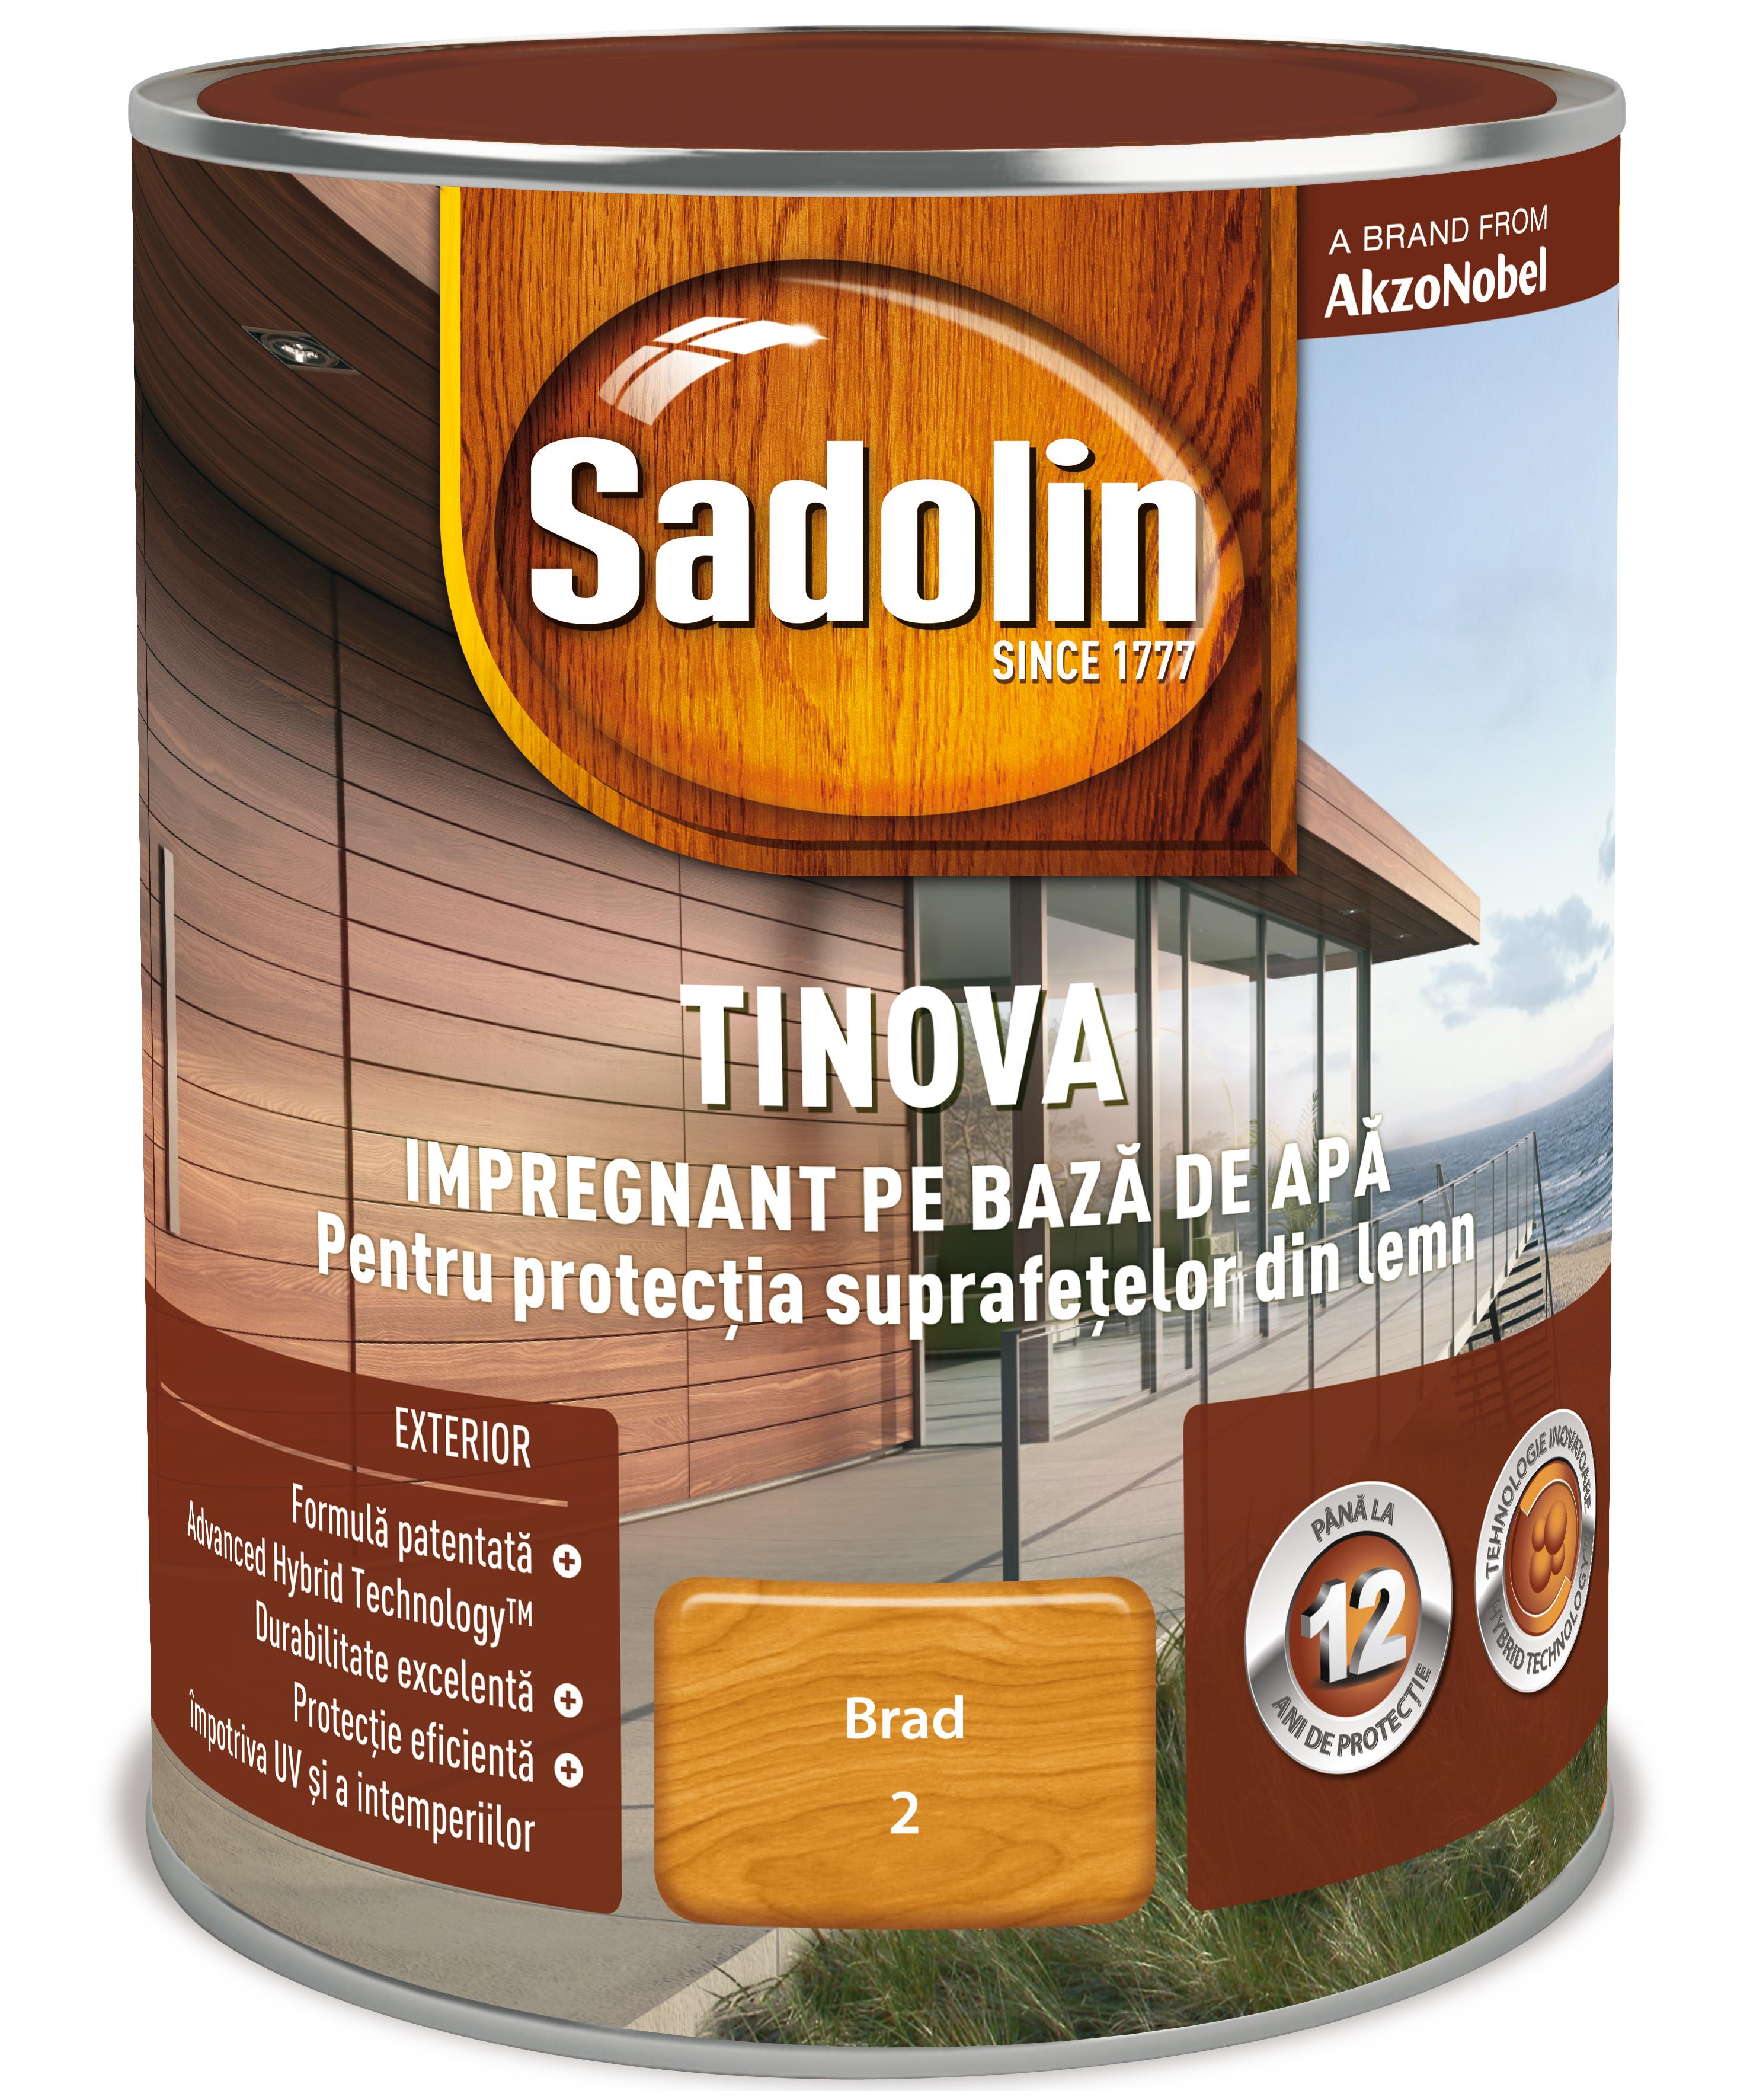 Impregnant pe baza de apa, Sadolin Tinova, pentru lemn, brad, 5 l mathaus 2021